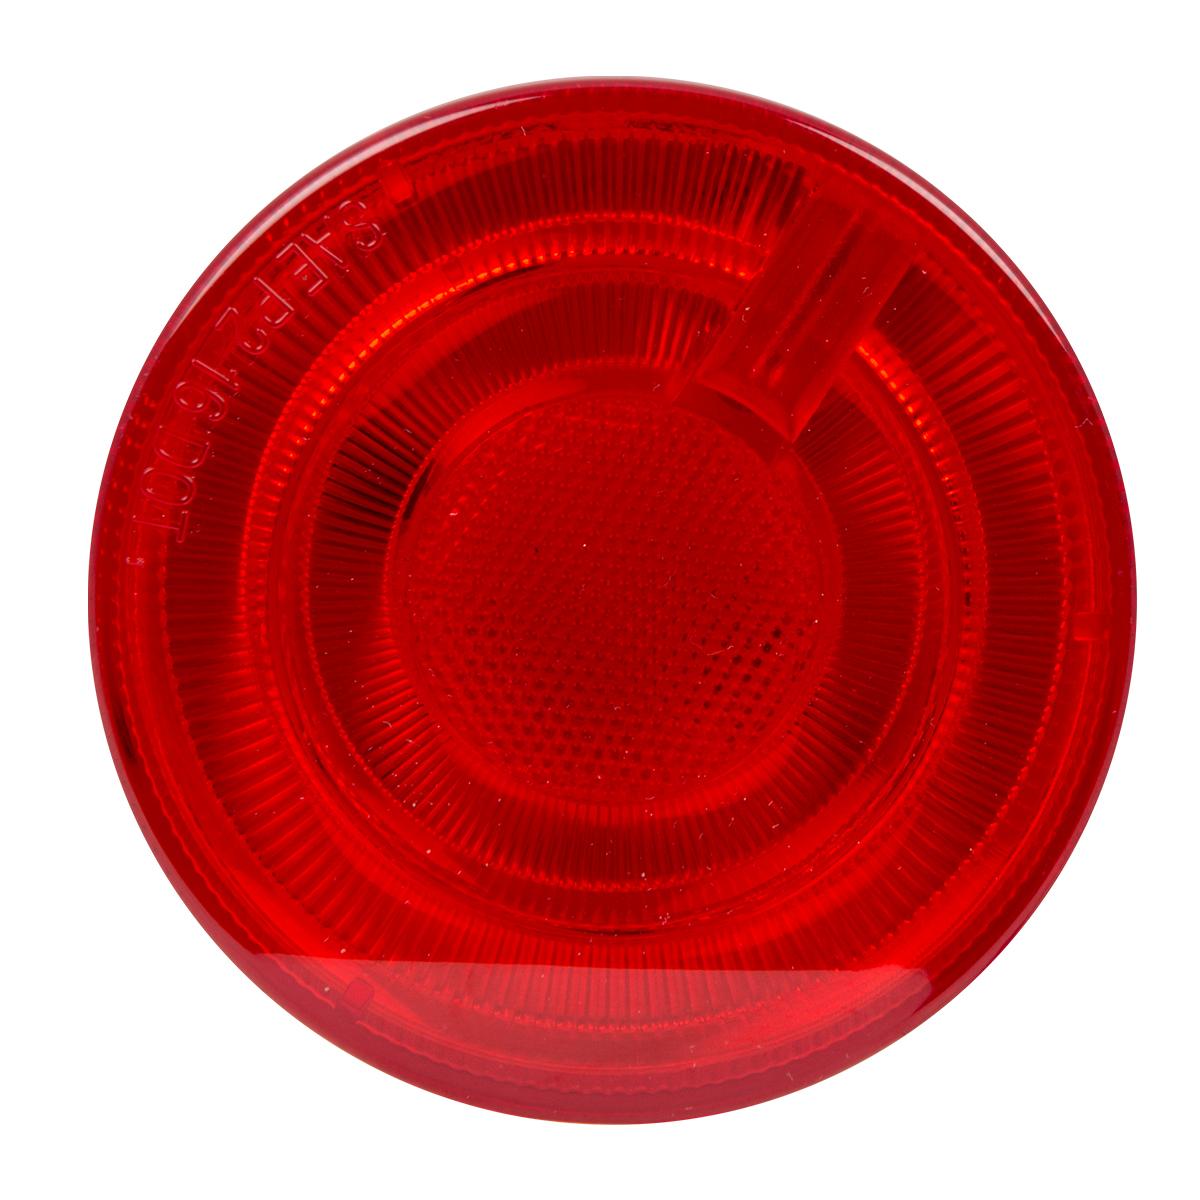 "75942 2-1/2"" Prime LED Marker Light"